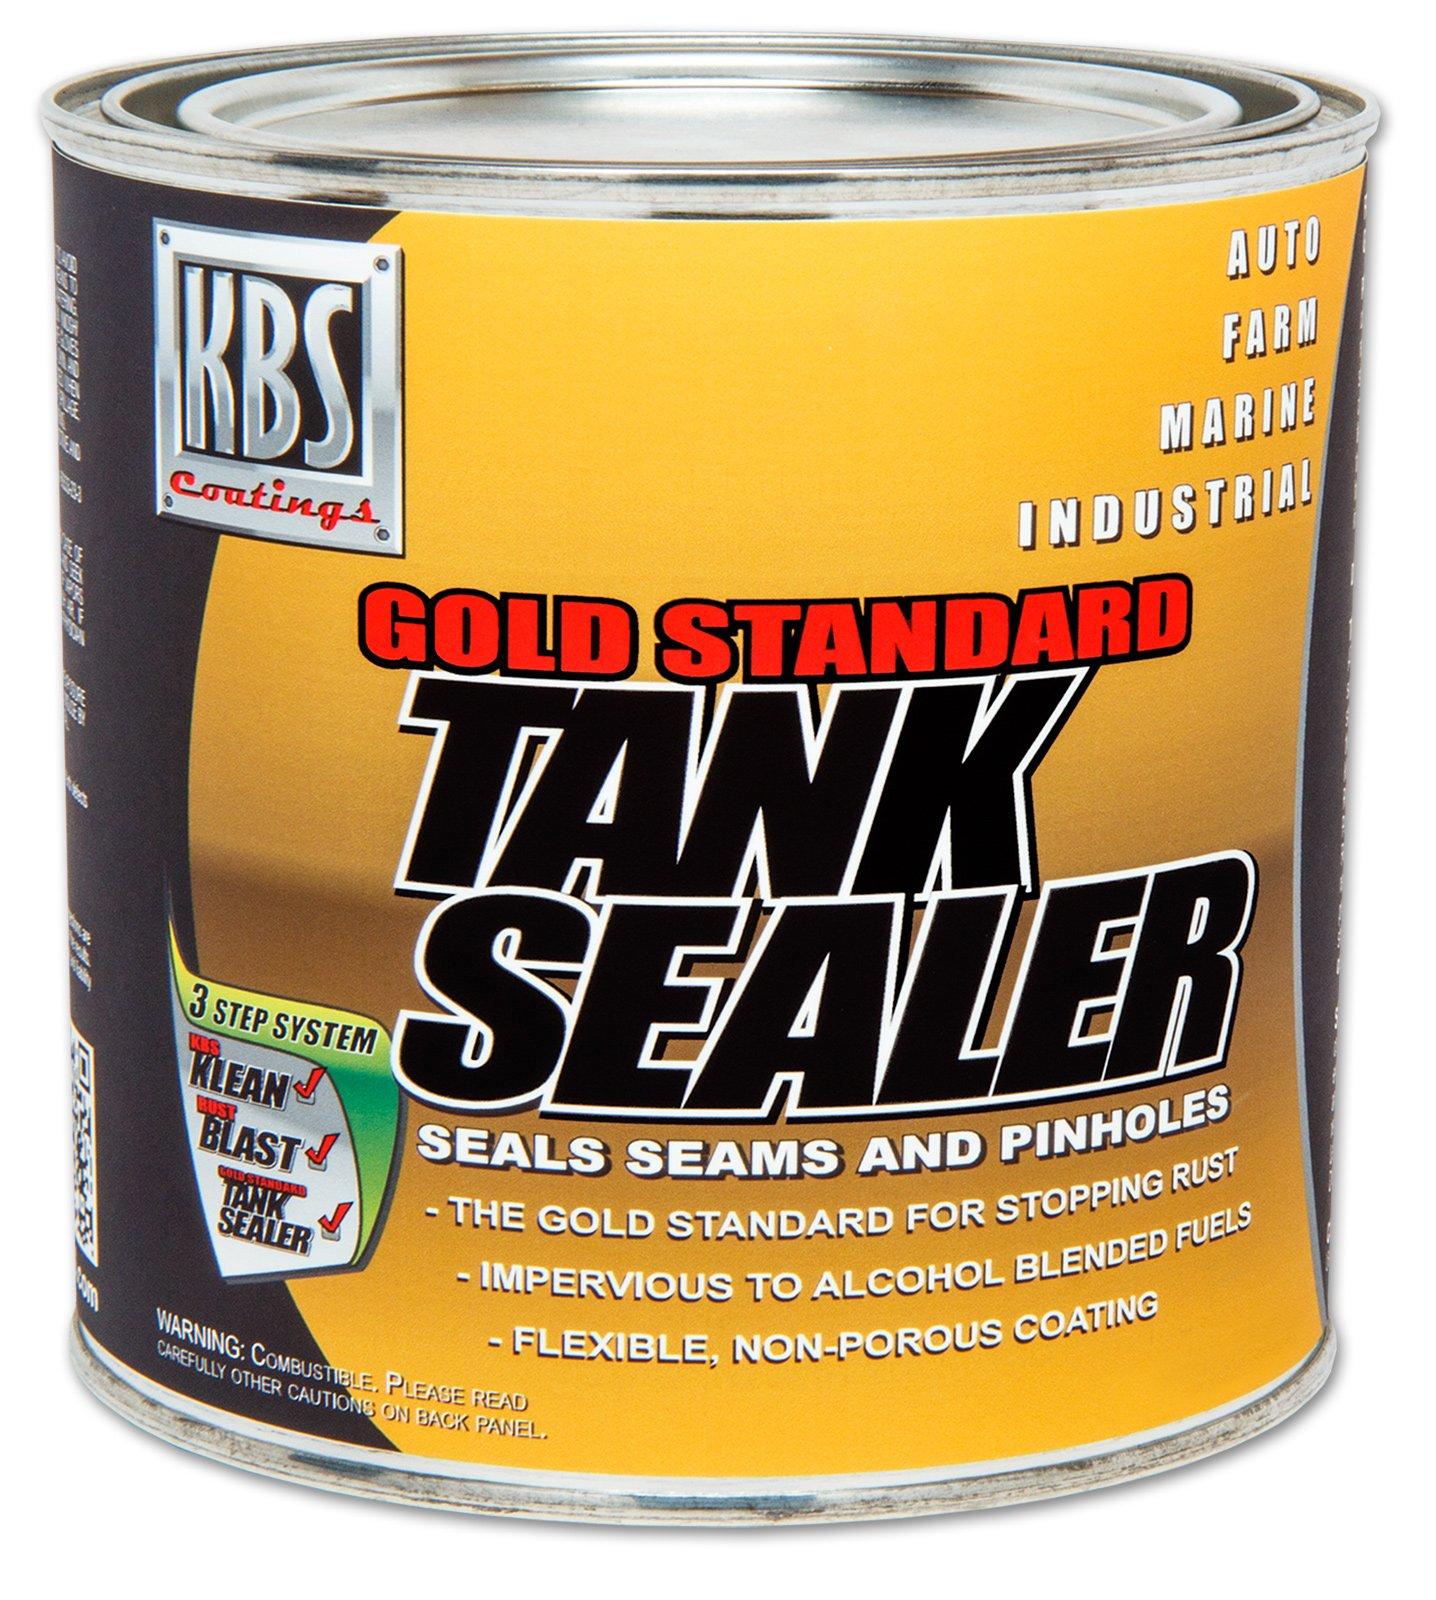 KBS Coatings 5200 Gold Standard Tank Sealer - 8 fl. oz.